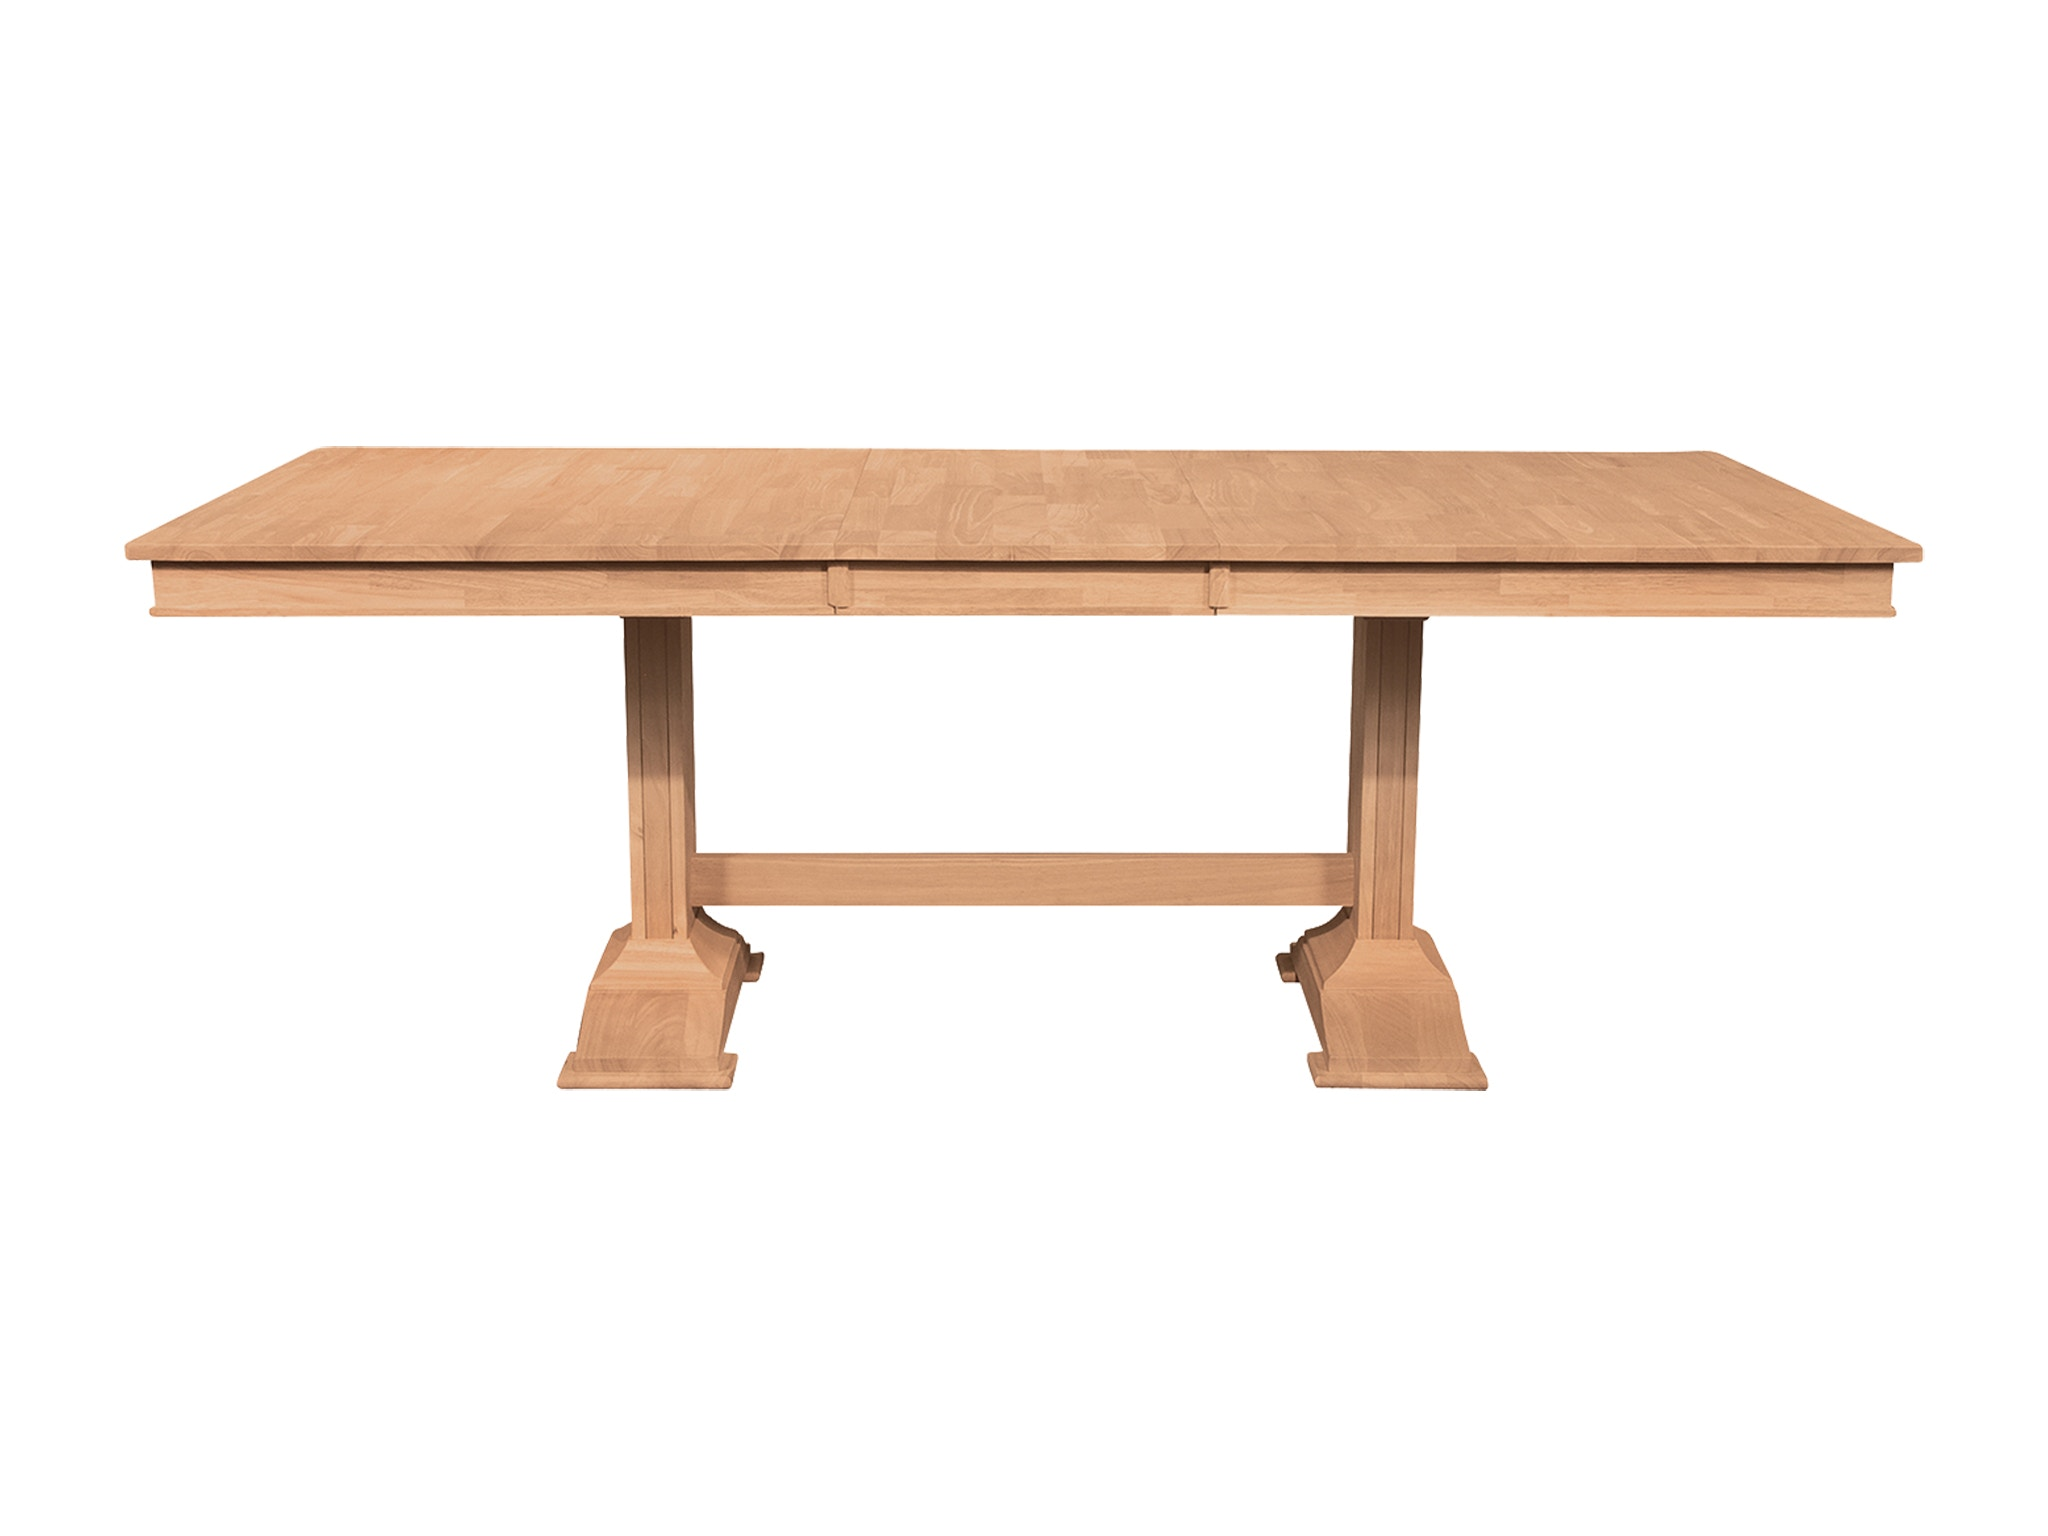 John Thomas Dining Room Trestle Table (top Only) / Trestle Table Baseu003cbr